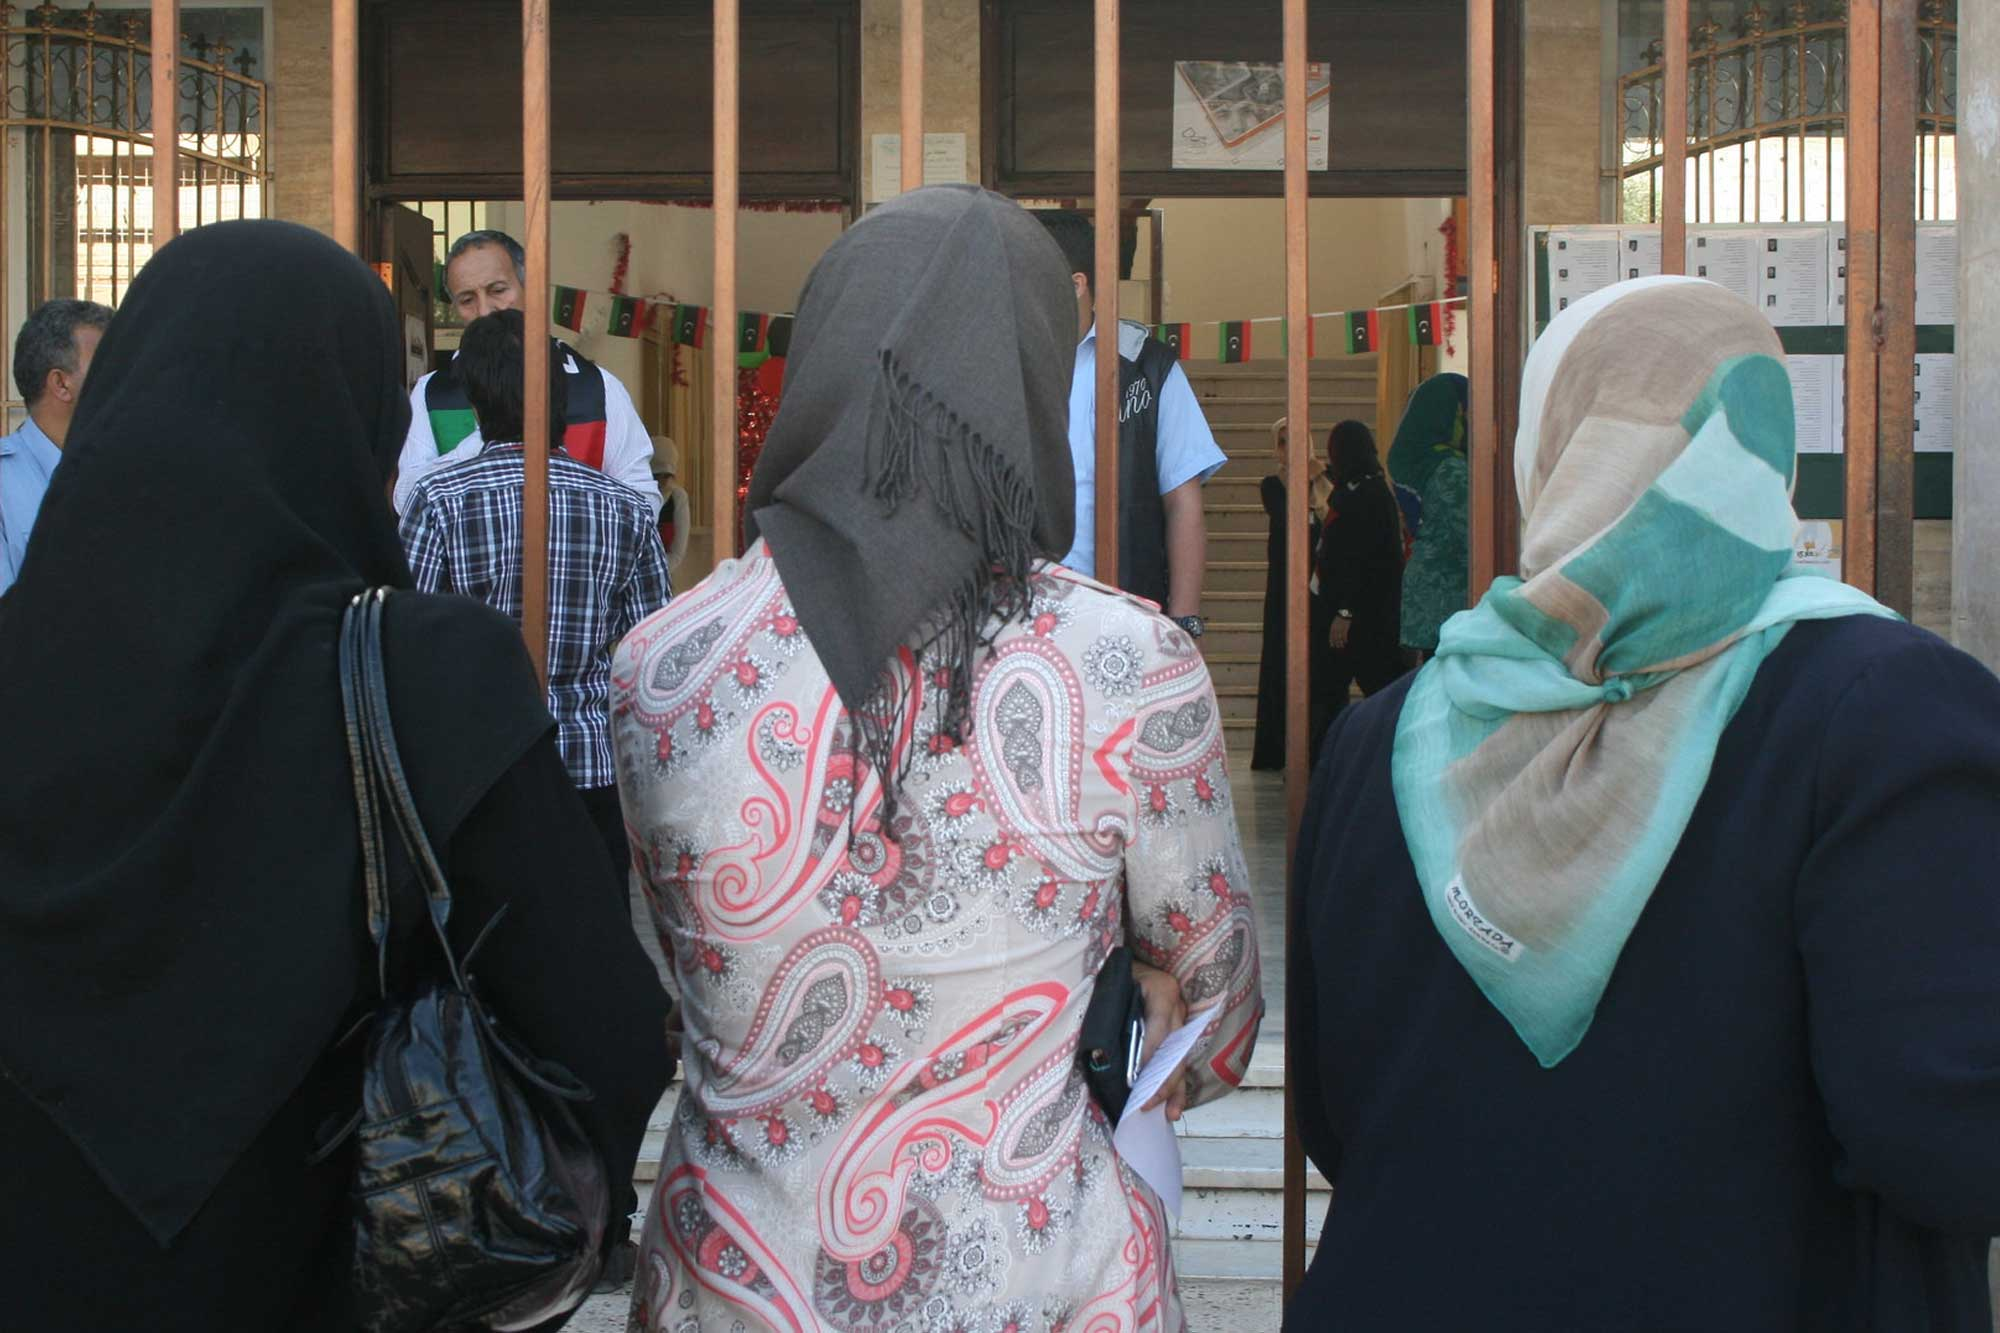 women look through gate